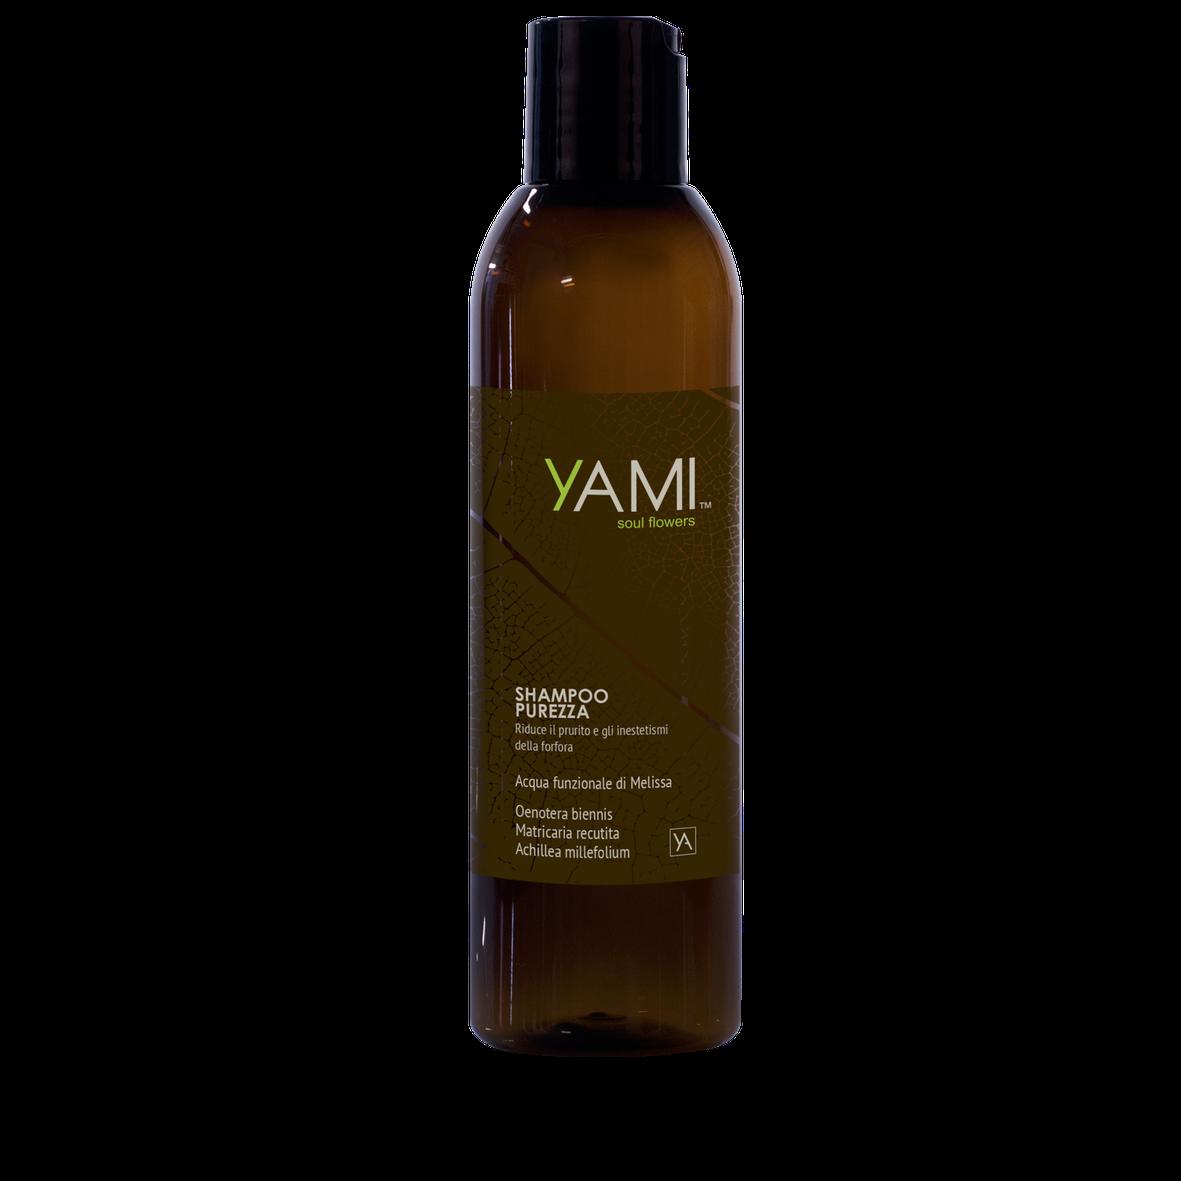 shampoo purezza 200ml